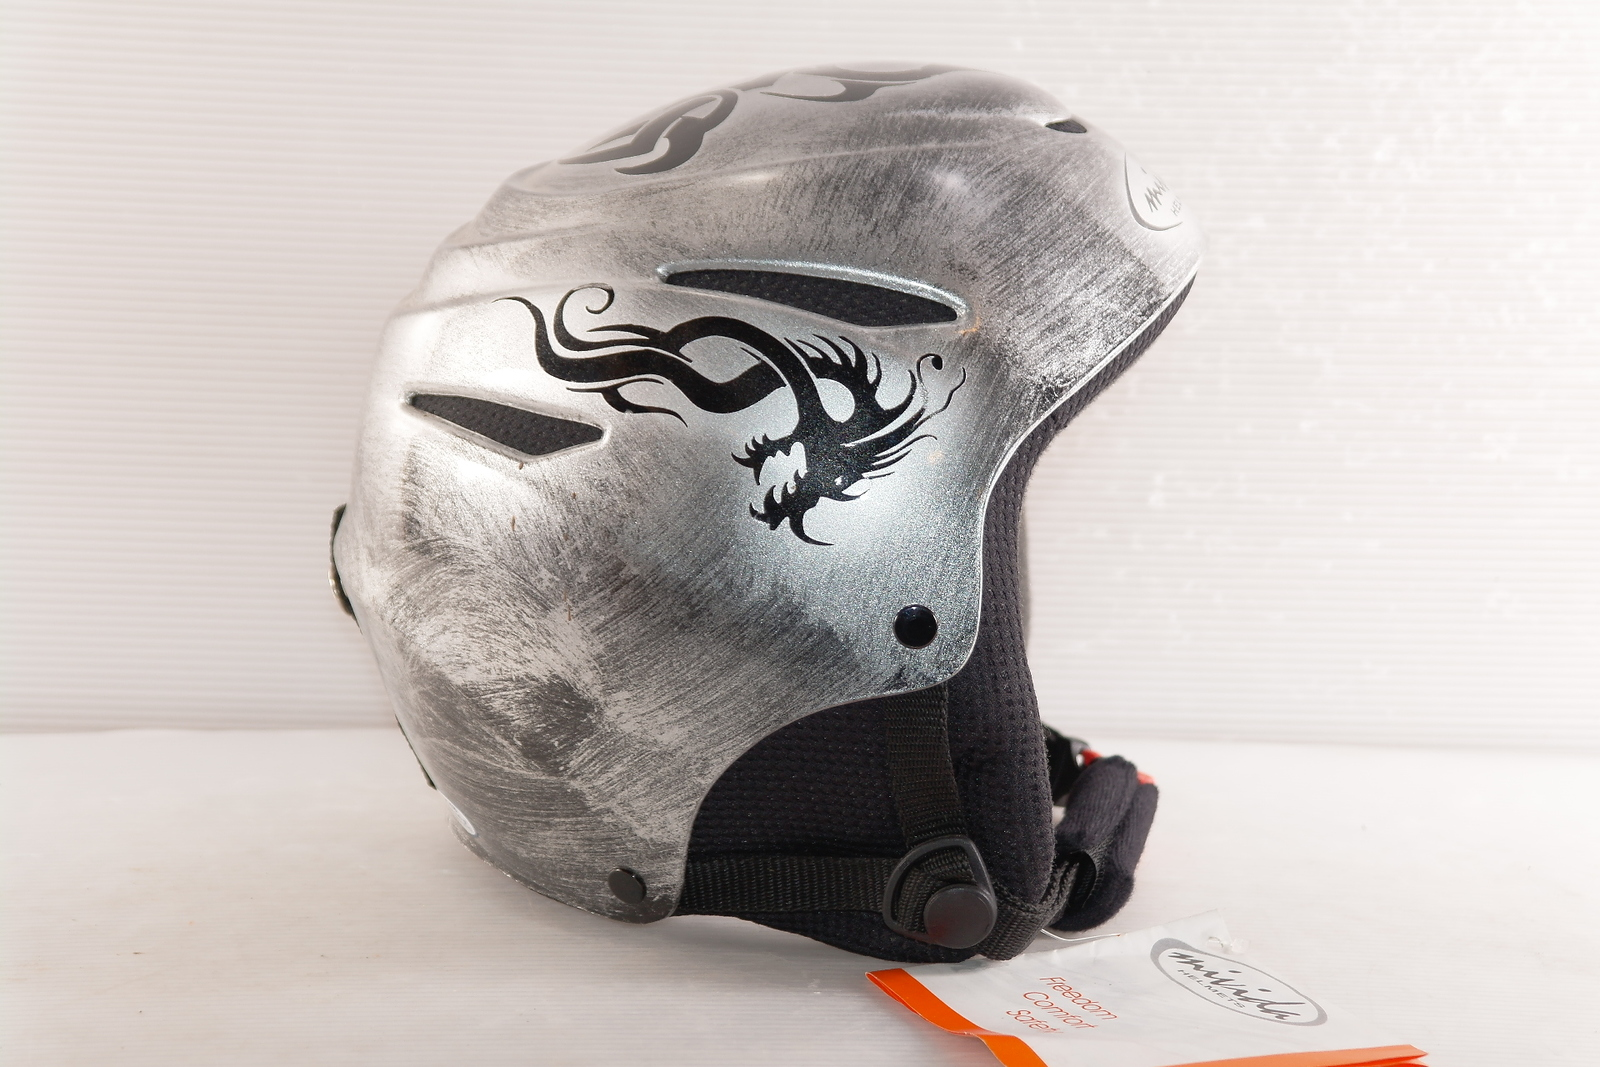 Lyžařská helma Mivida X-style tatoo vel. 58